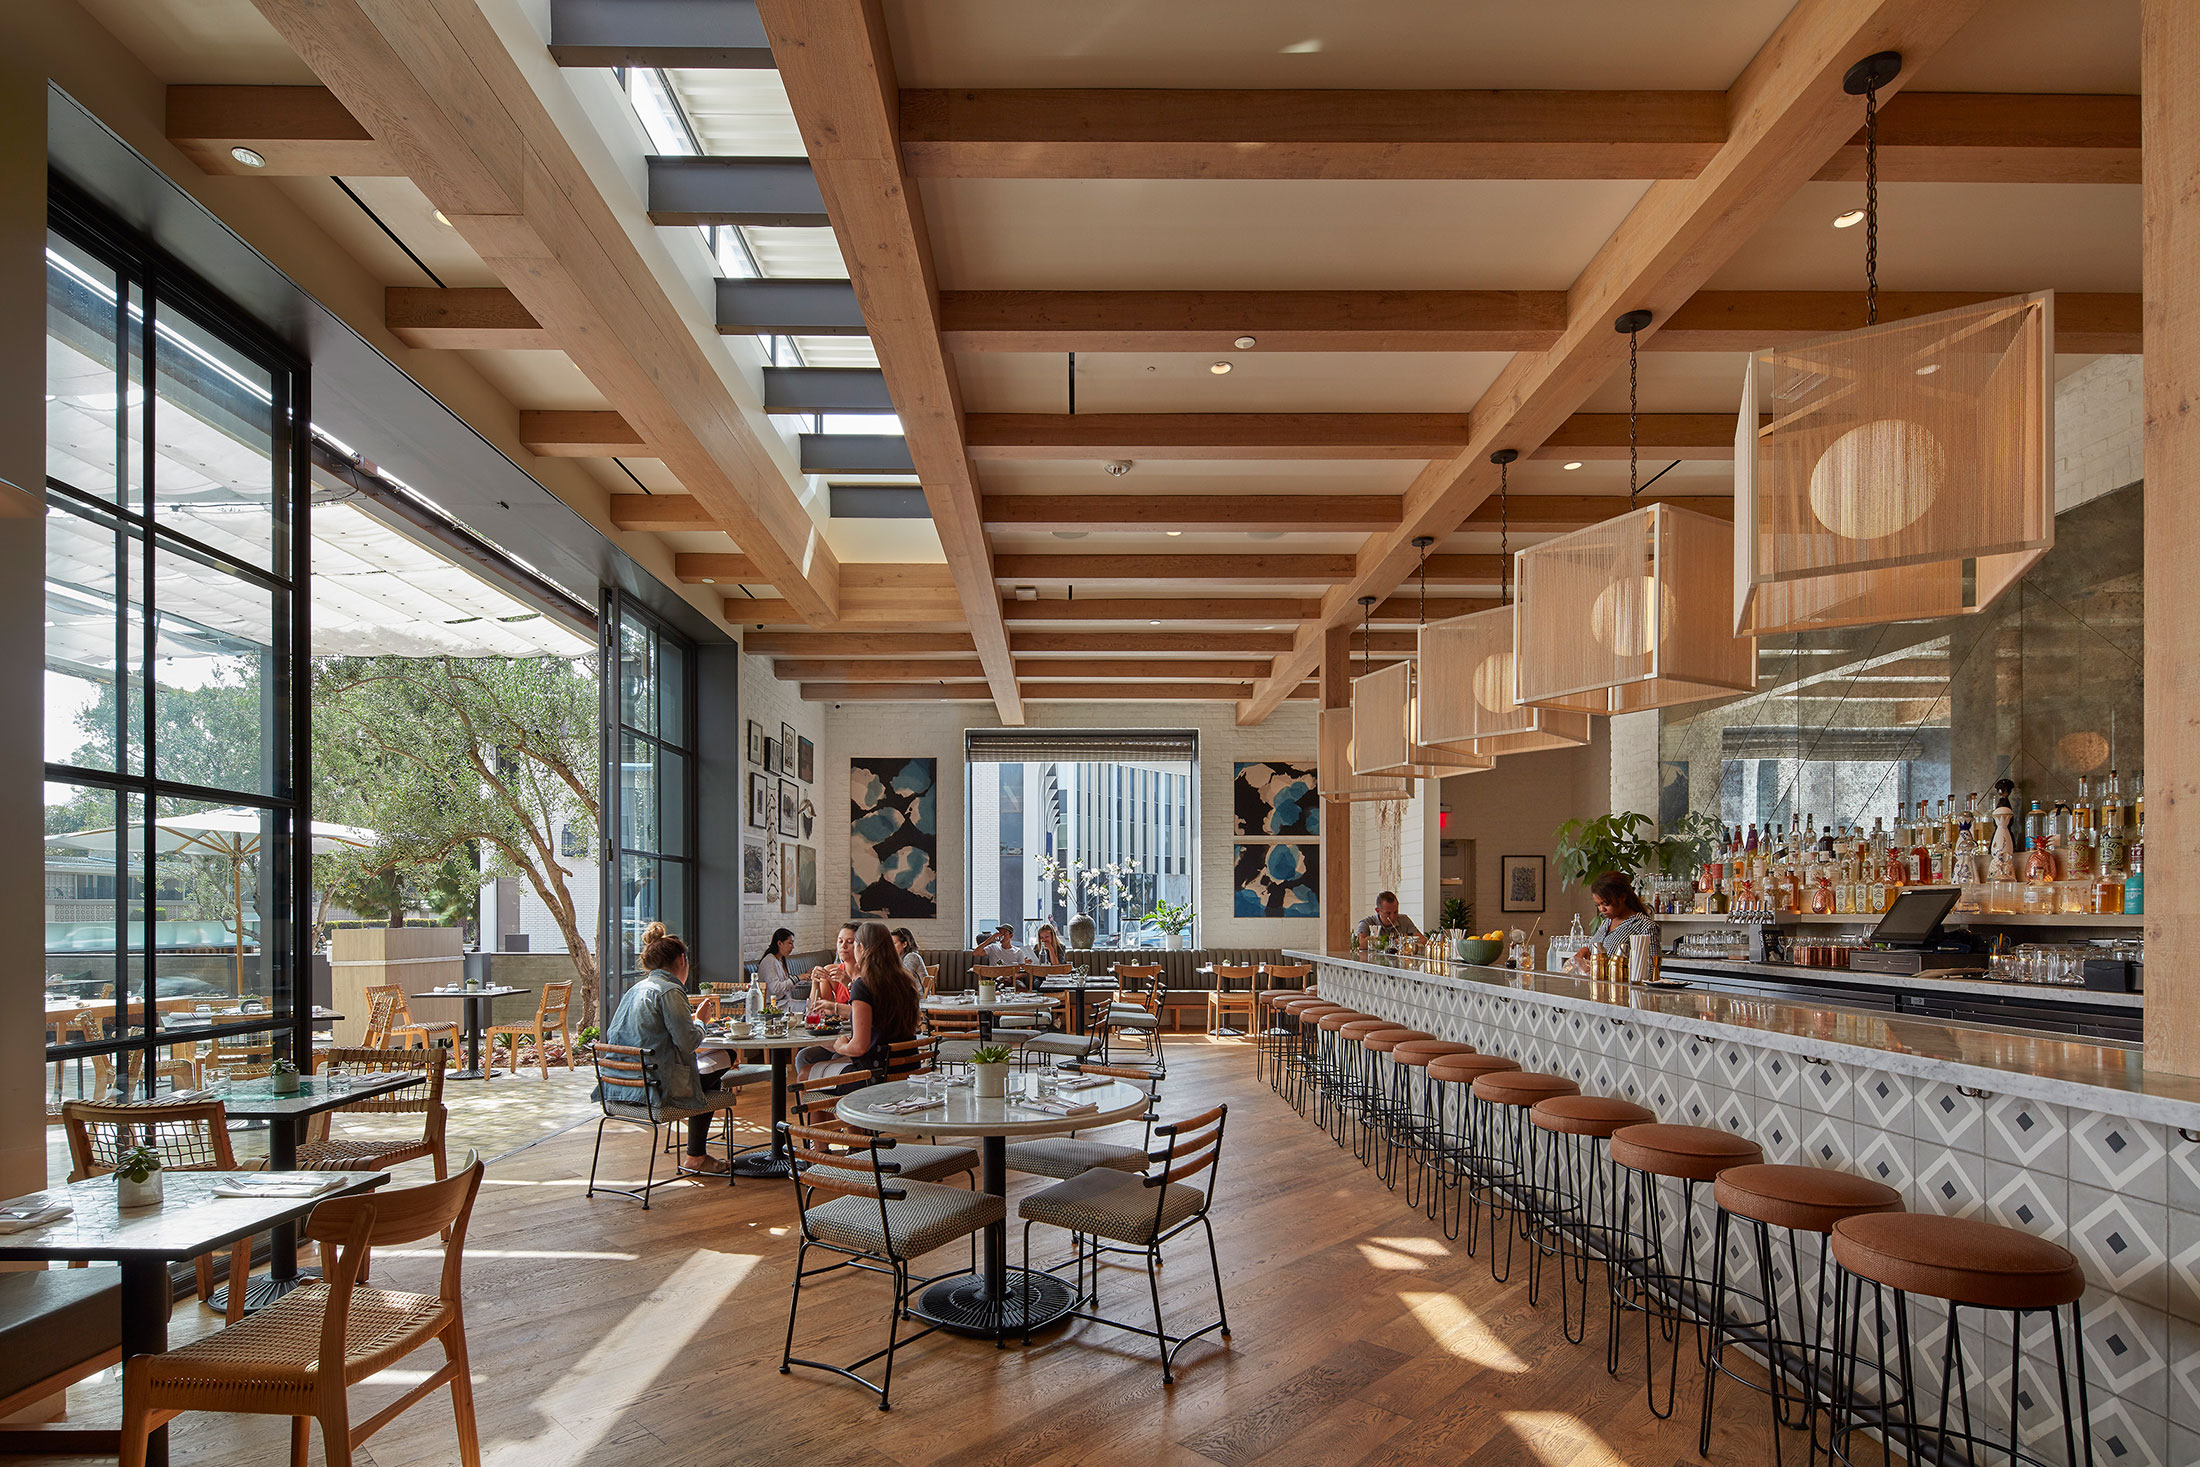 modern-architecture-building-mixed-use-sustainable-interior-shubindonaldson-castaway-commons-1